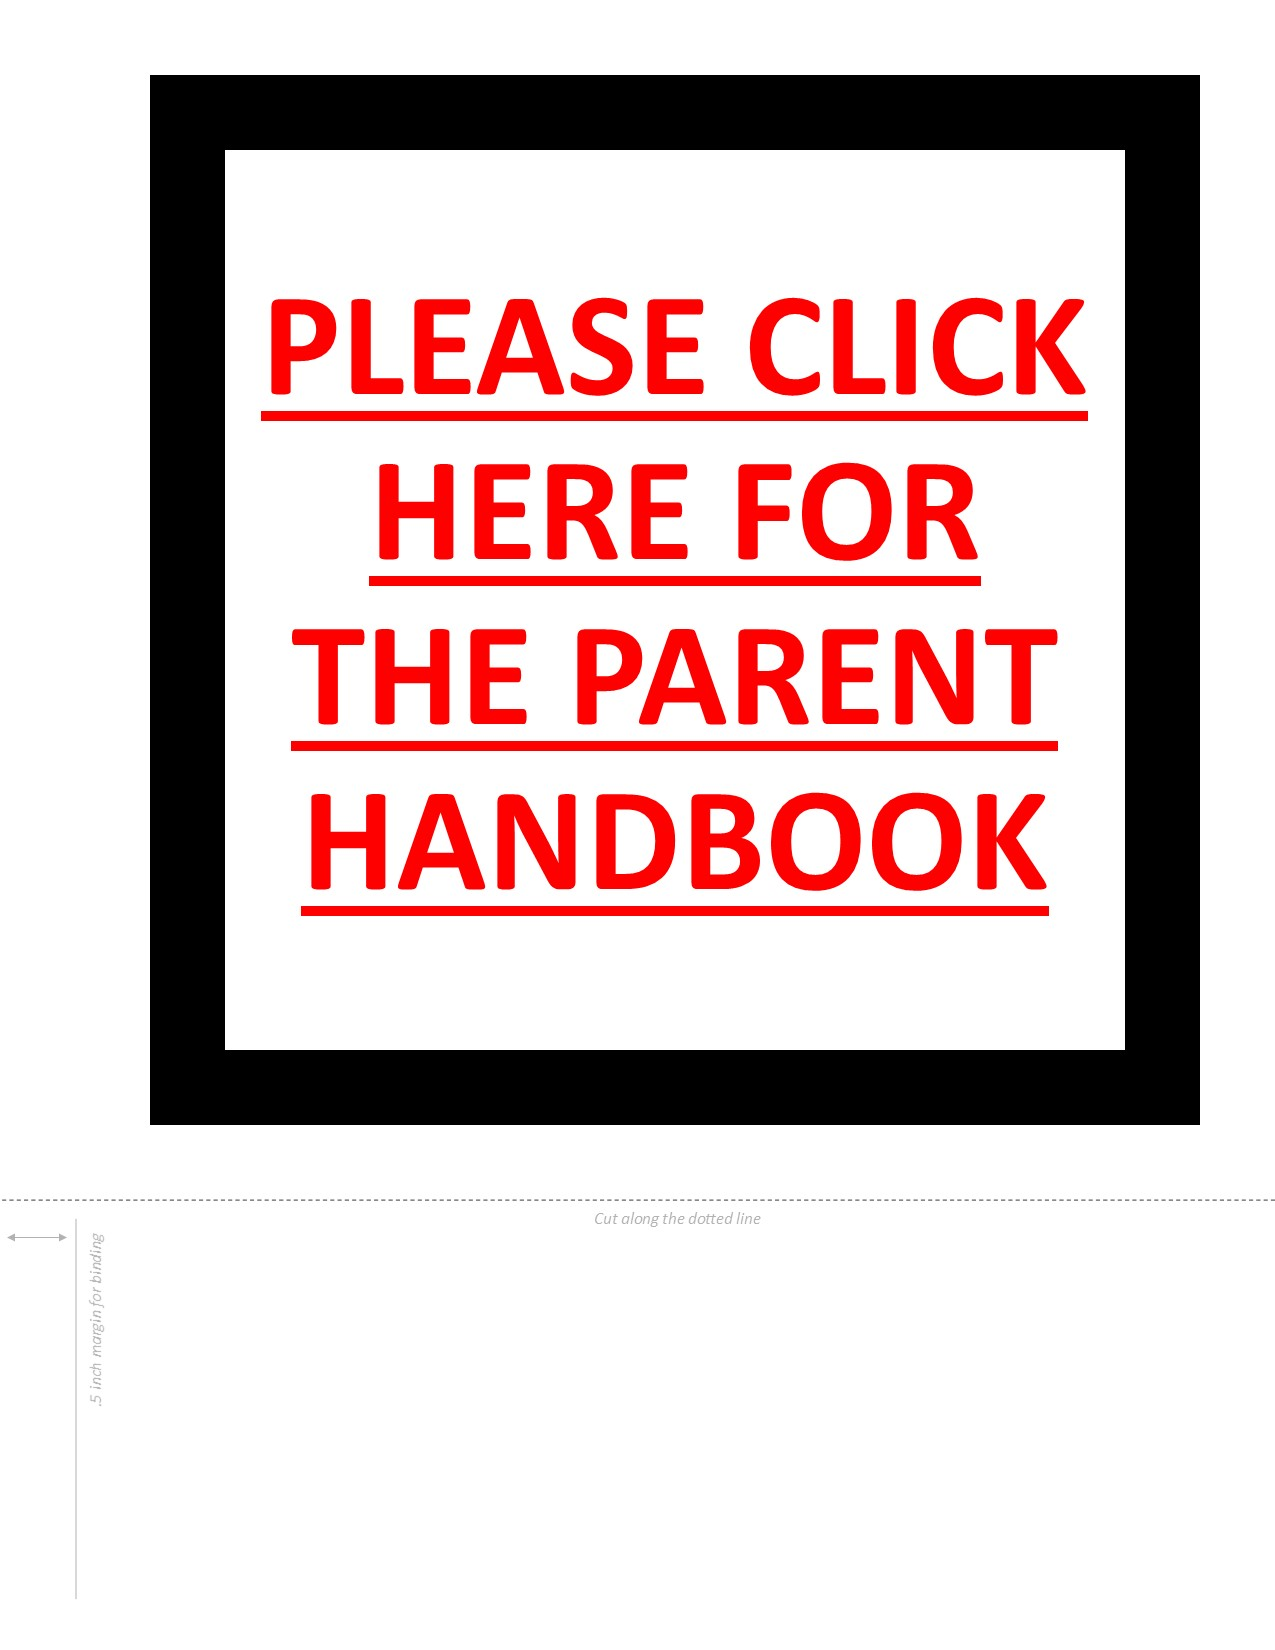 https://northwoodbroom.co.uk/images/COVID/Parent_Handbook_Image.jpg